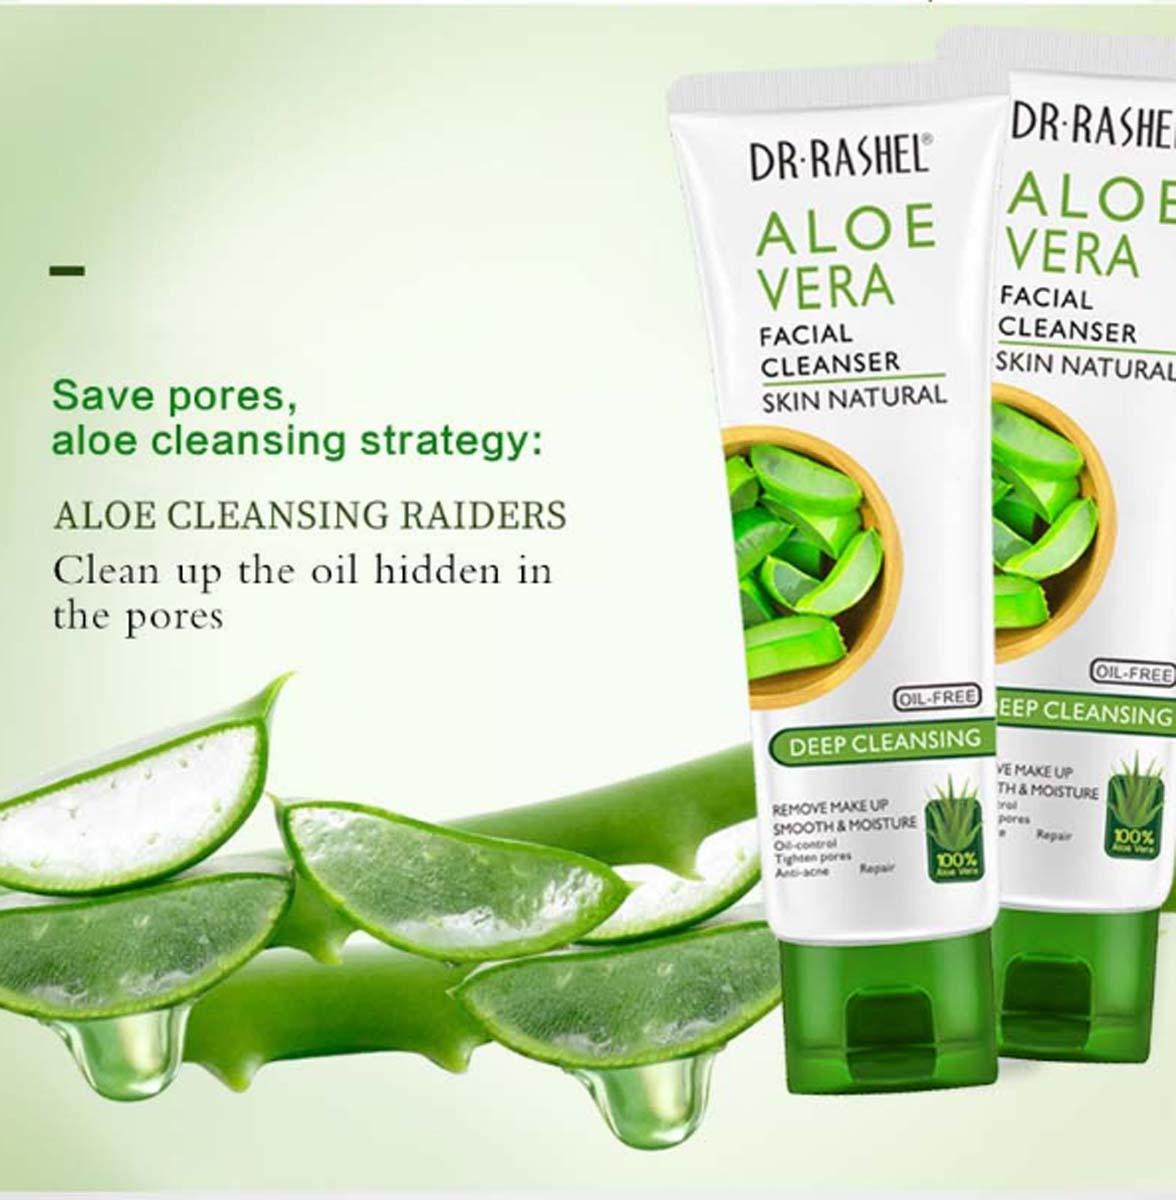 DR.RASHEL Makeup Remover Aloe vera soothing & moisturizing gel Face Wash  Whitening Fade Dark Spot Cleanser DRL 1530: Buy Online at Best Prices in  Pakistan | Daraz.pk